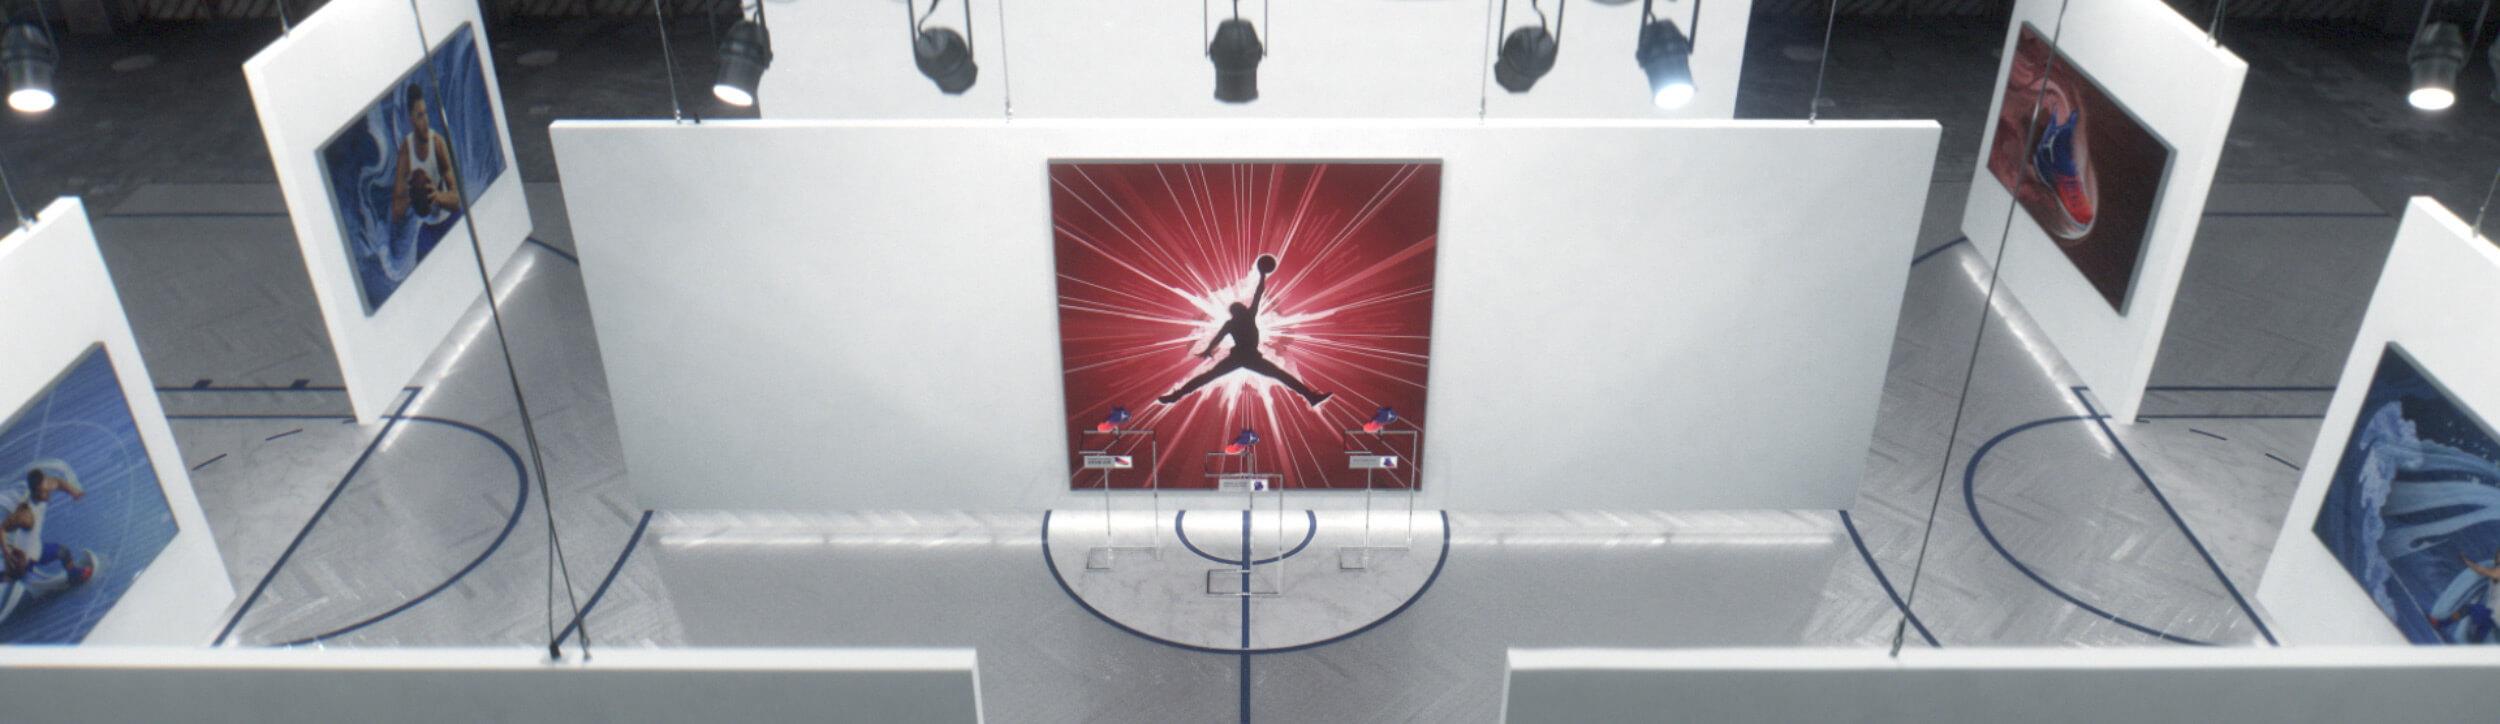 Jordan VR Gallery -